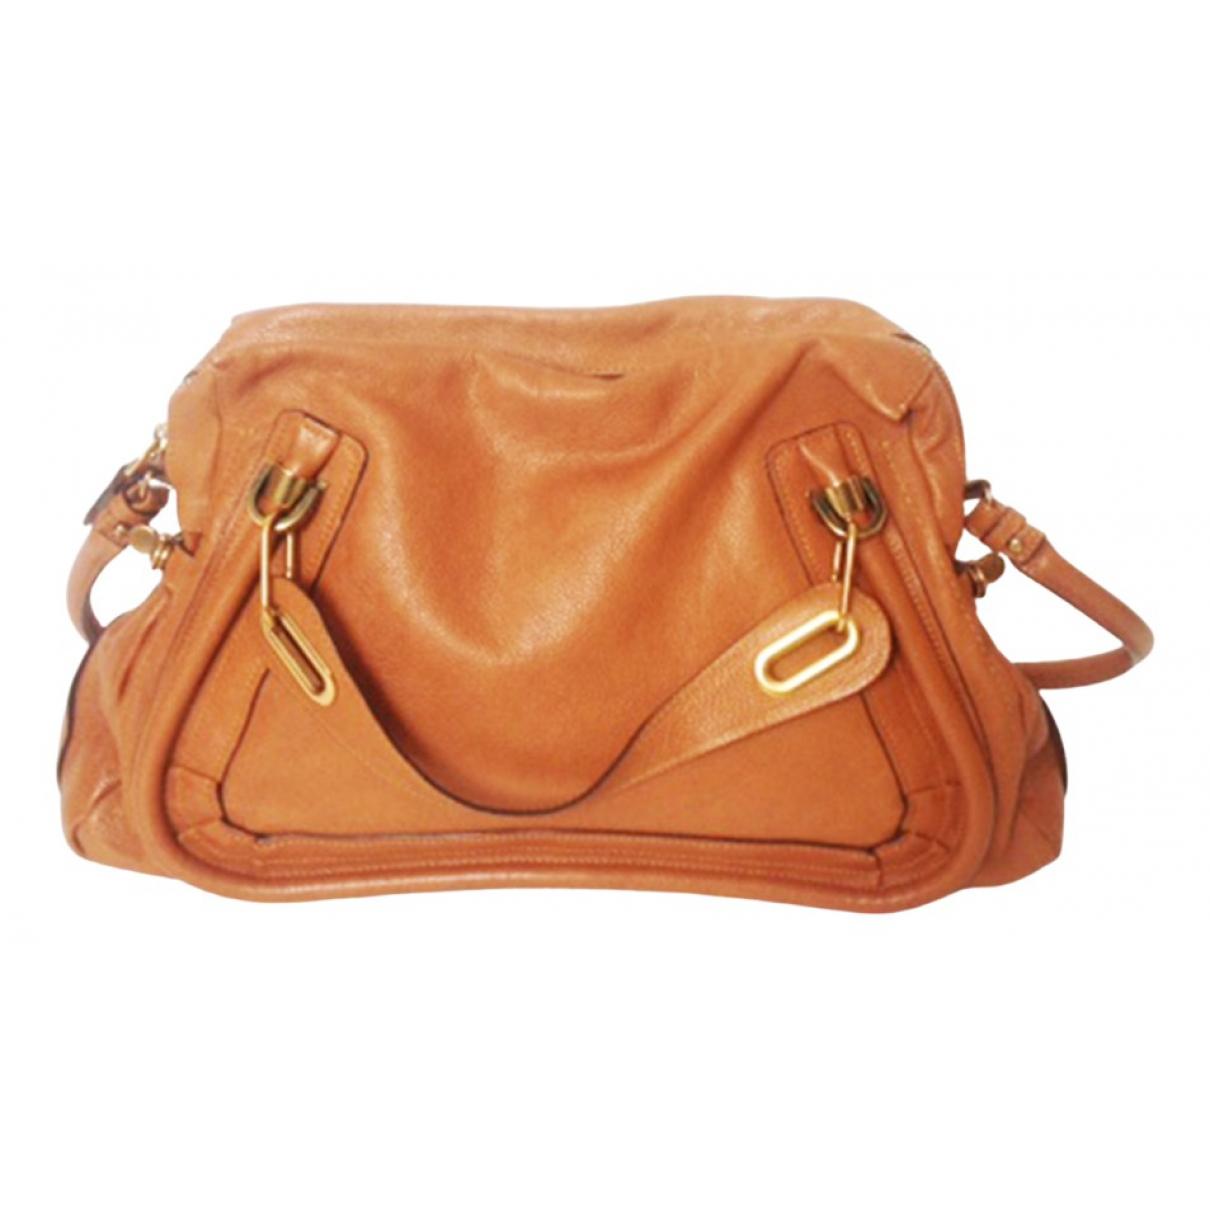 Chloé Paraty Brown Leather handbag for Women N